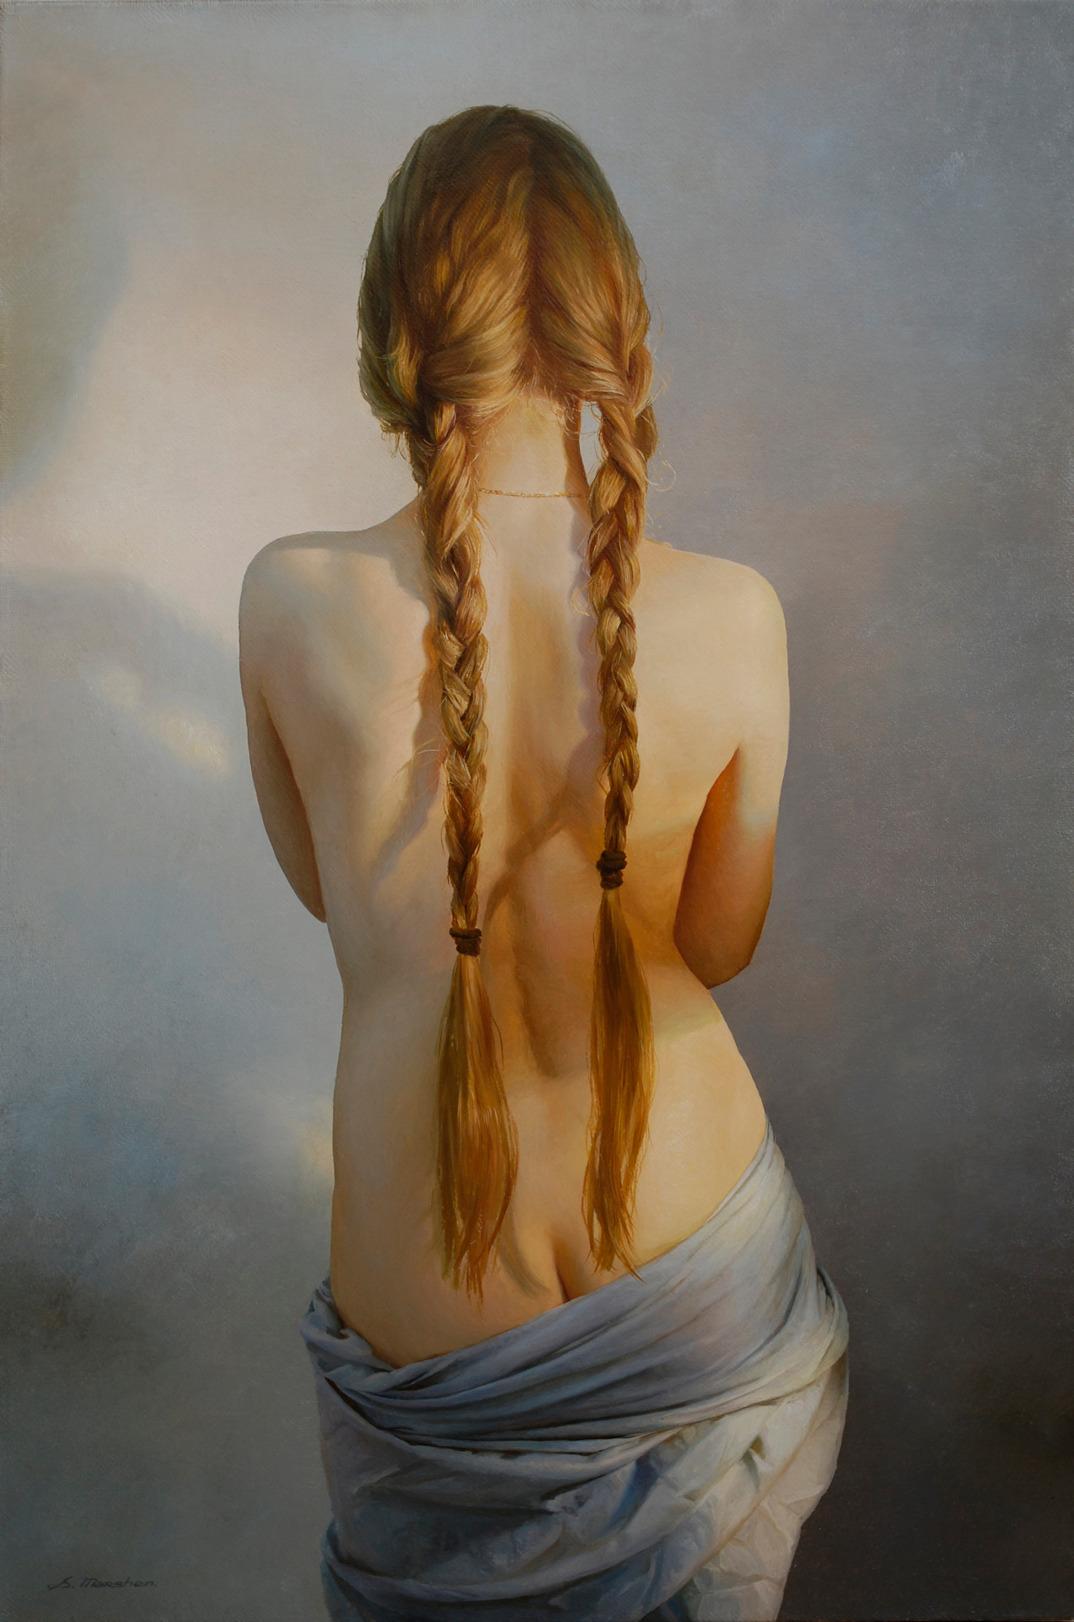 dipinti-olio-donne-seducenti-sensuali-sergei-marshennikov-12